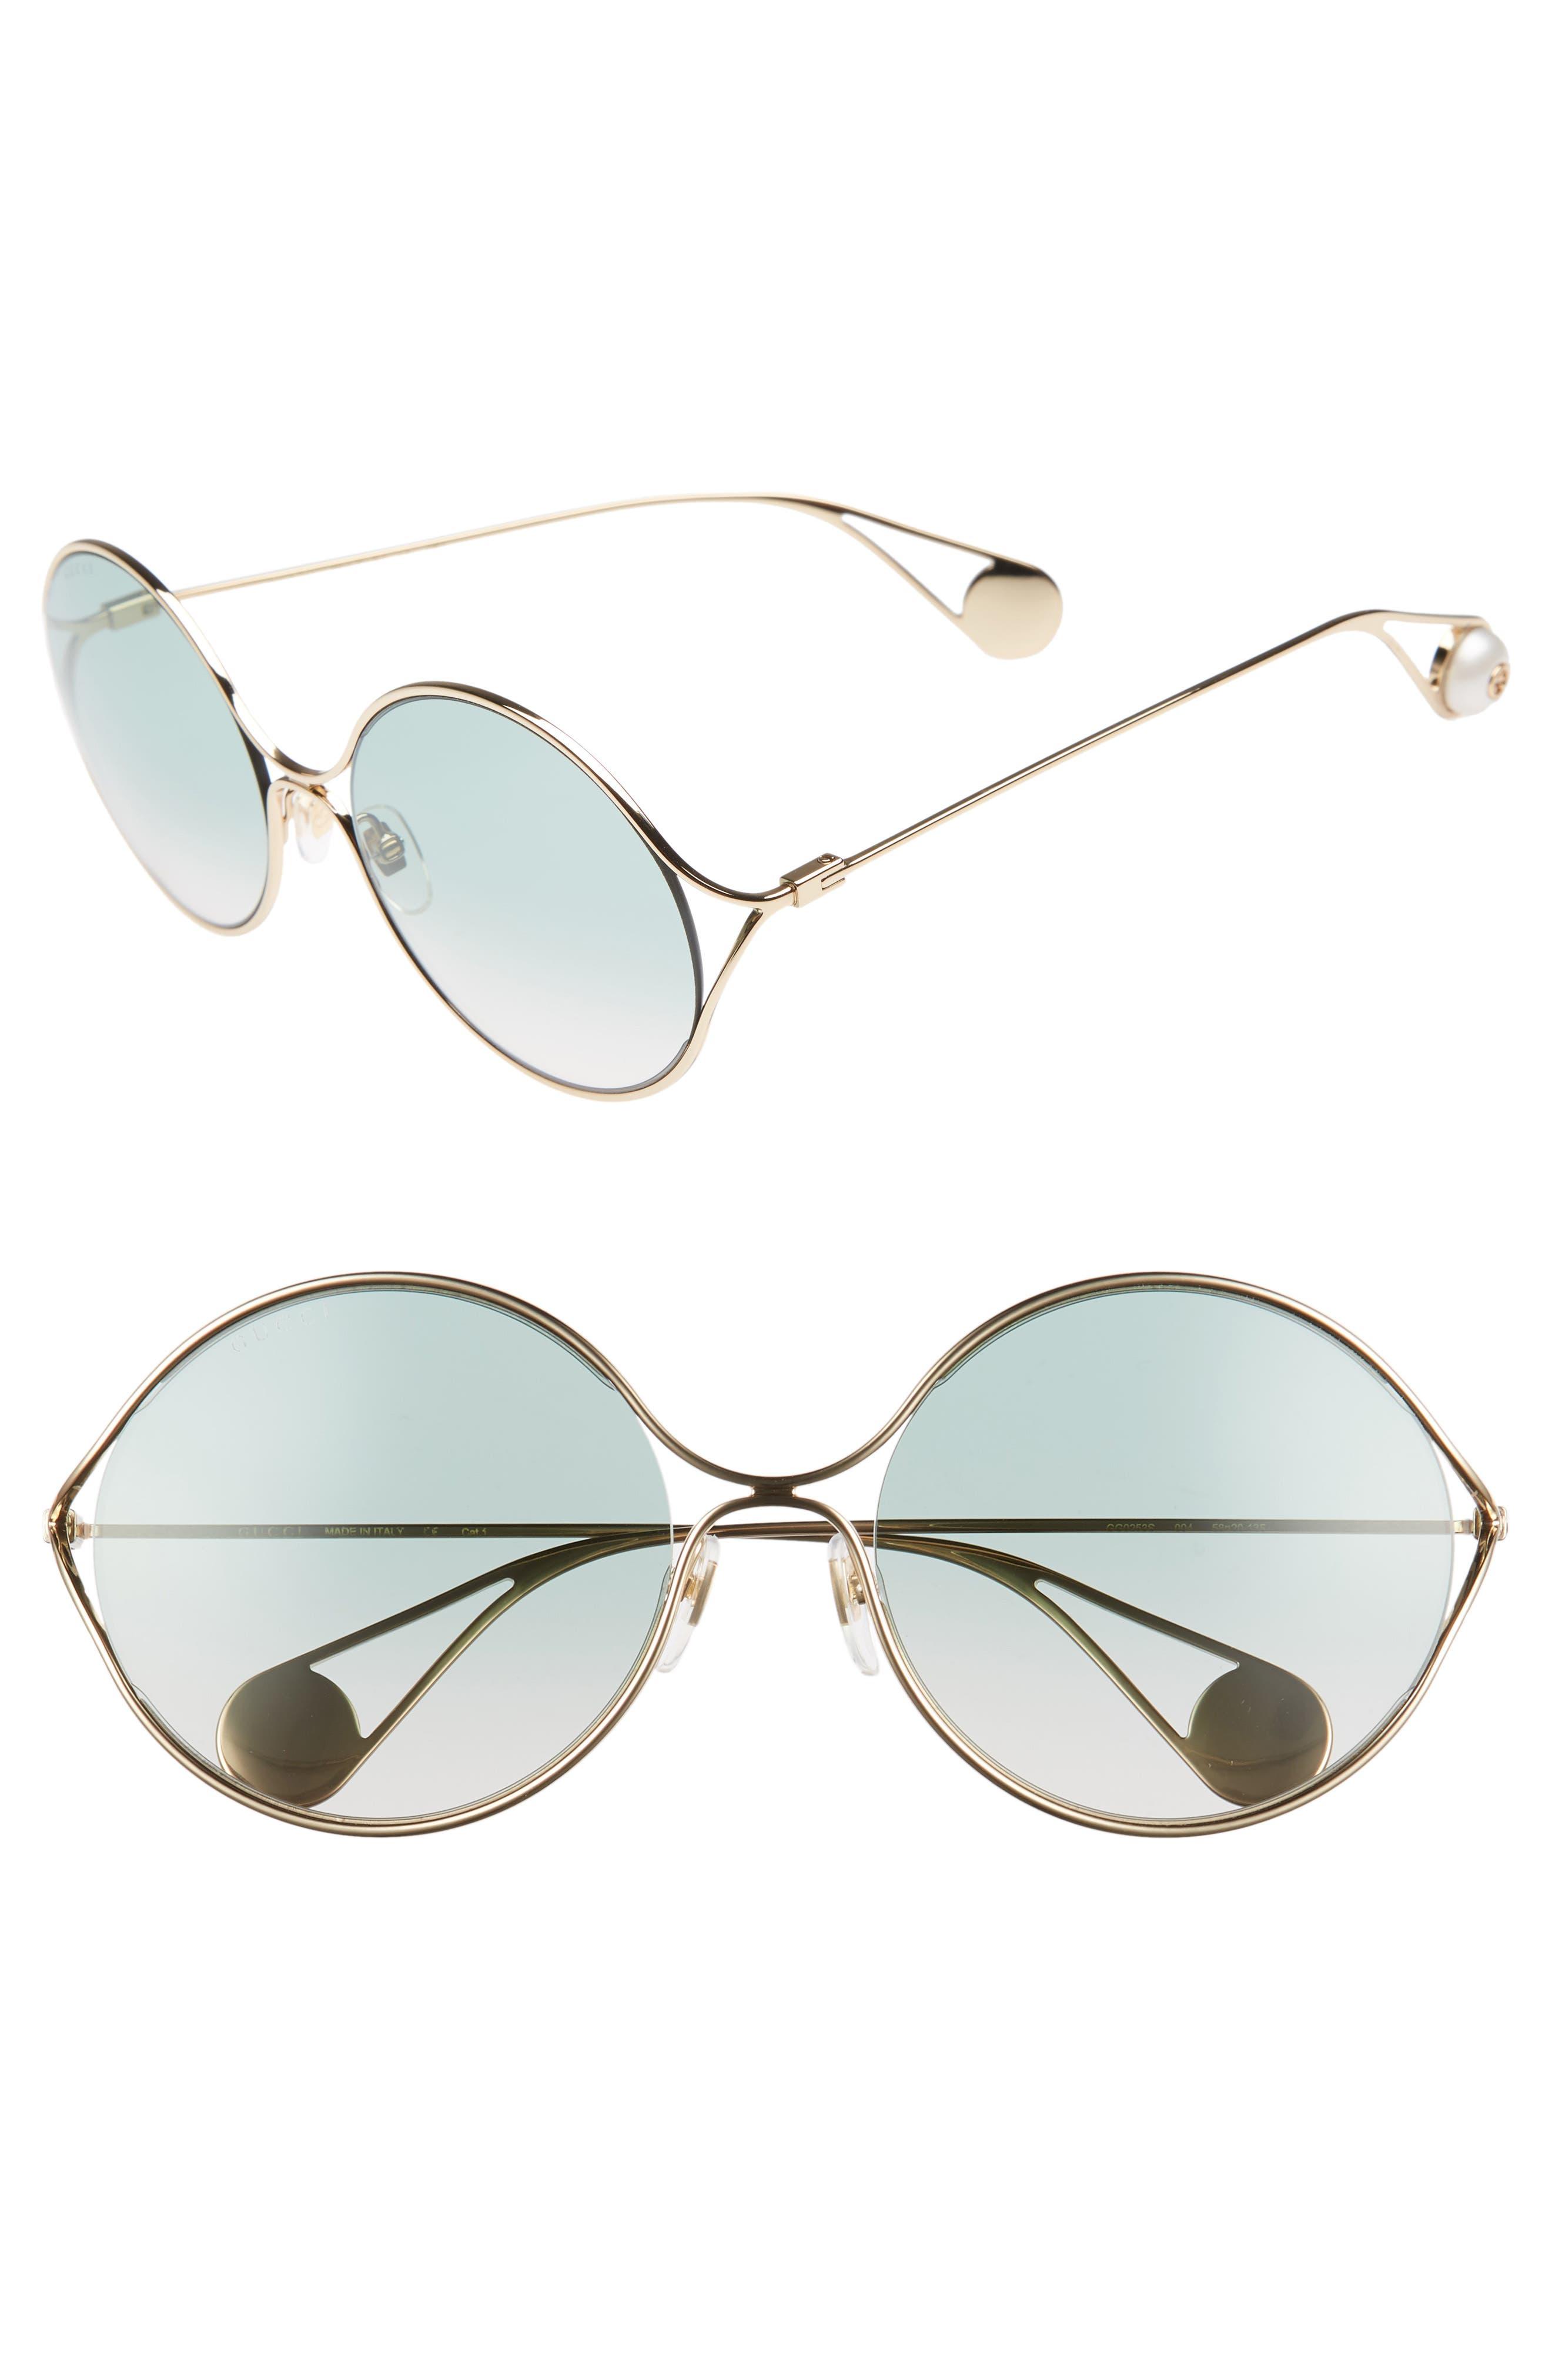 58mm Gradient Lens Round Sunglasses,                         Main,                         color, GOLD/ SAGE/ PINK